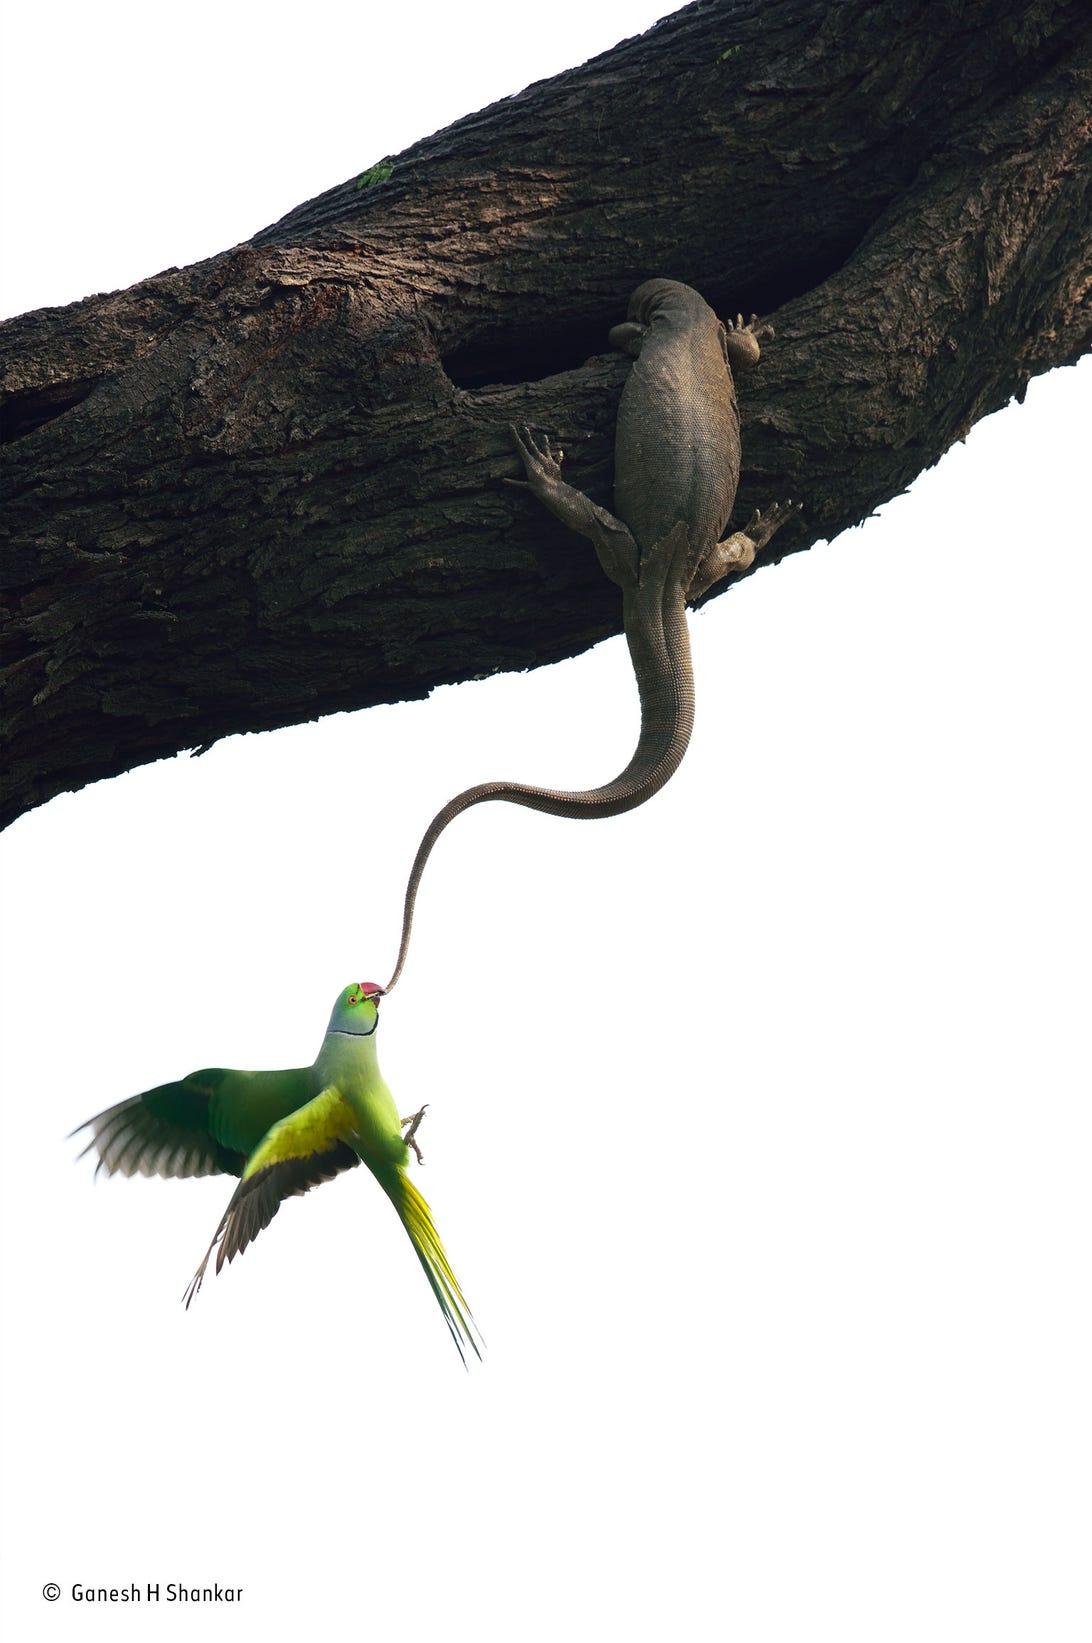 ganesh-h-shankarwildlife-photographer-of-the-year-birds-winner.jpg